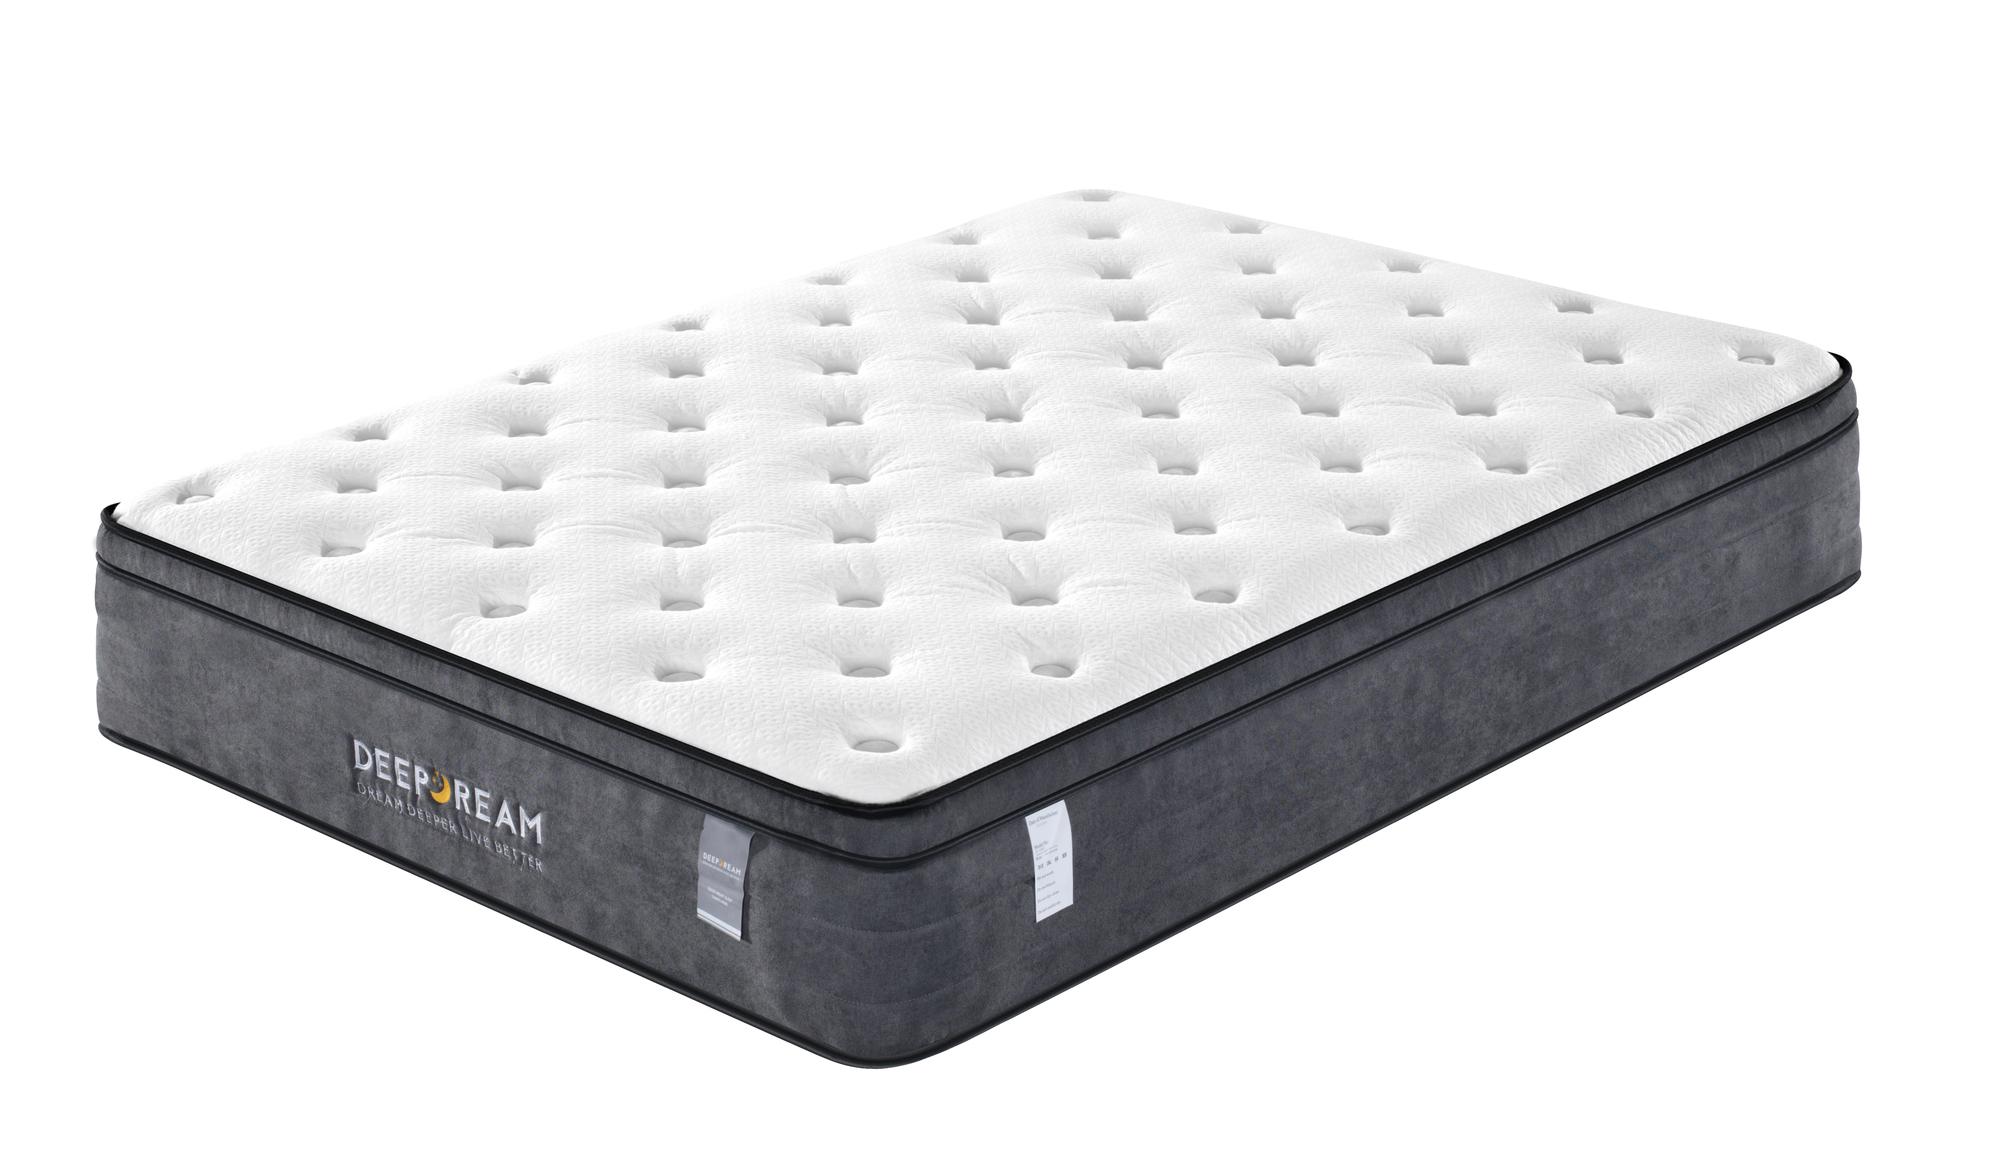 NEW-Essential-5-Zone-Foam-Mattress-NordicHouse-Bed-Mattresses thumbnail 10